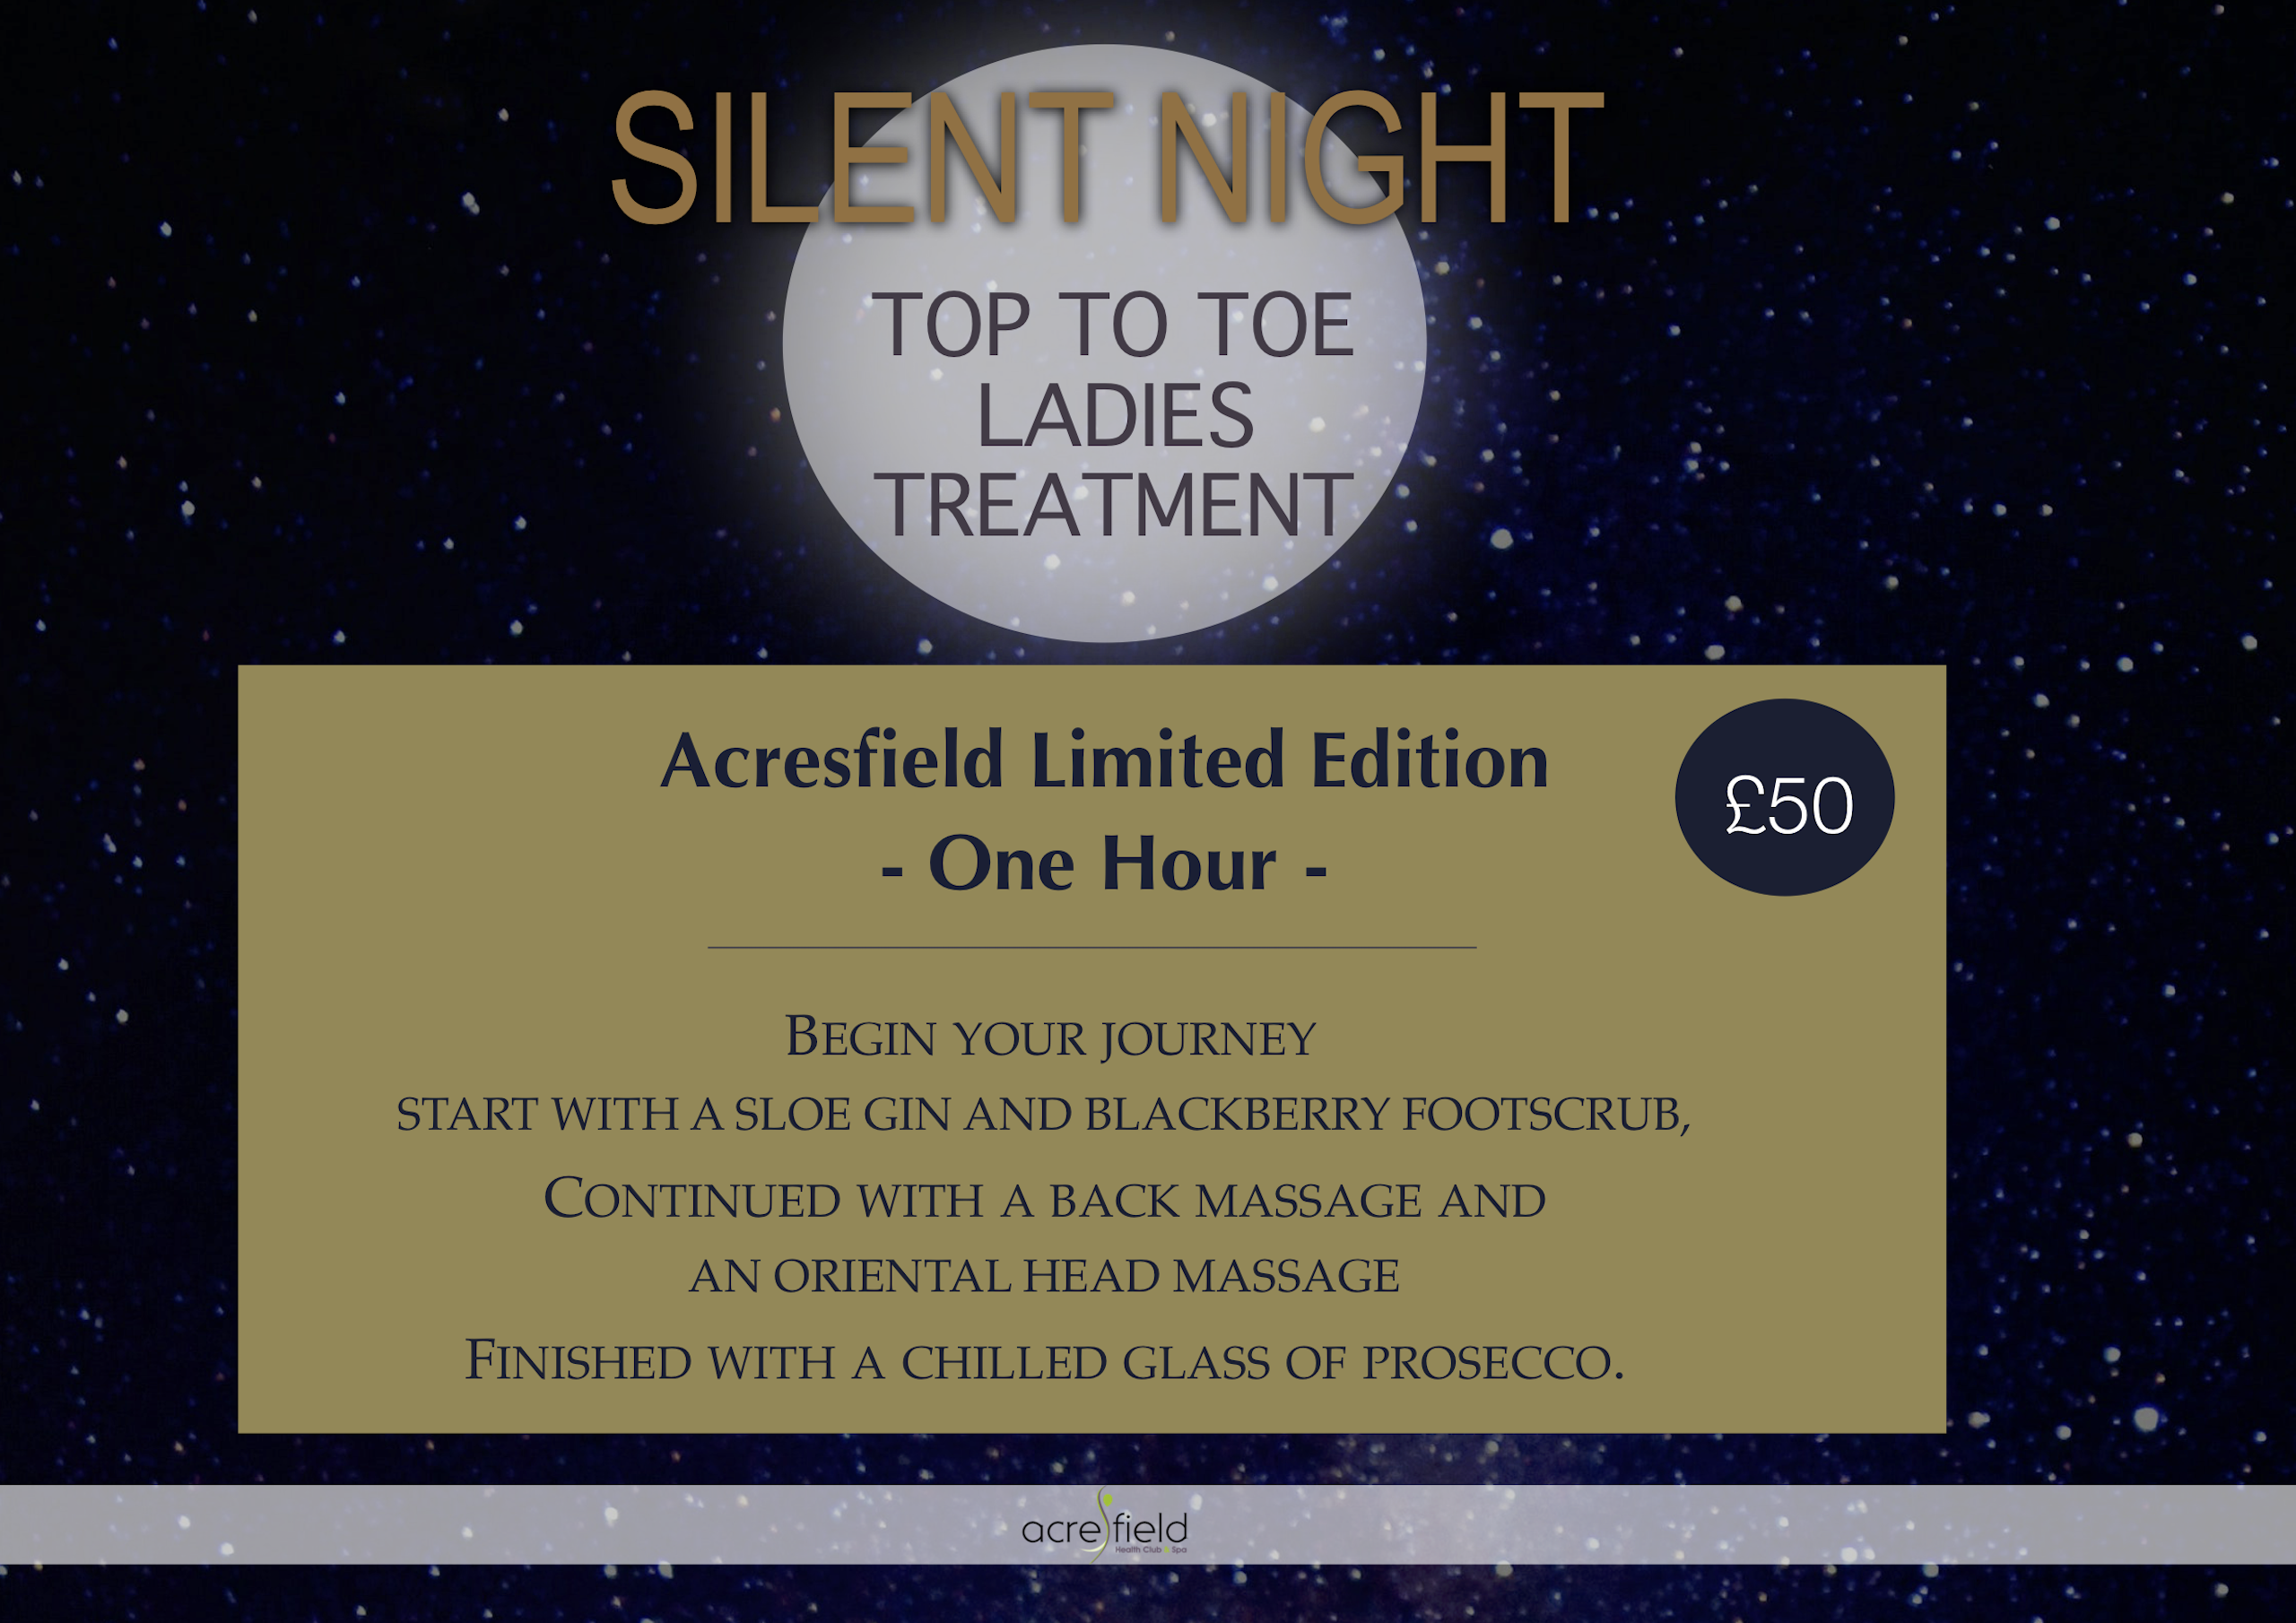 Silent night spa treatment